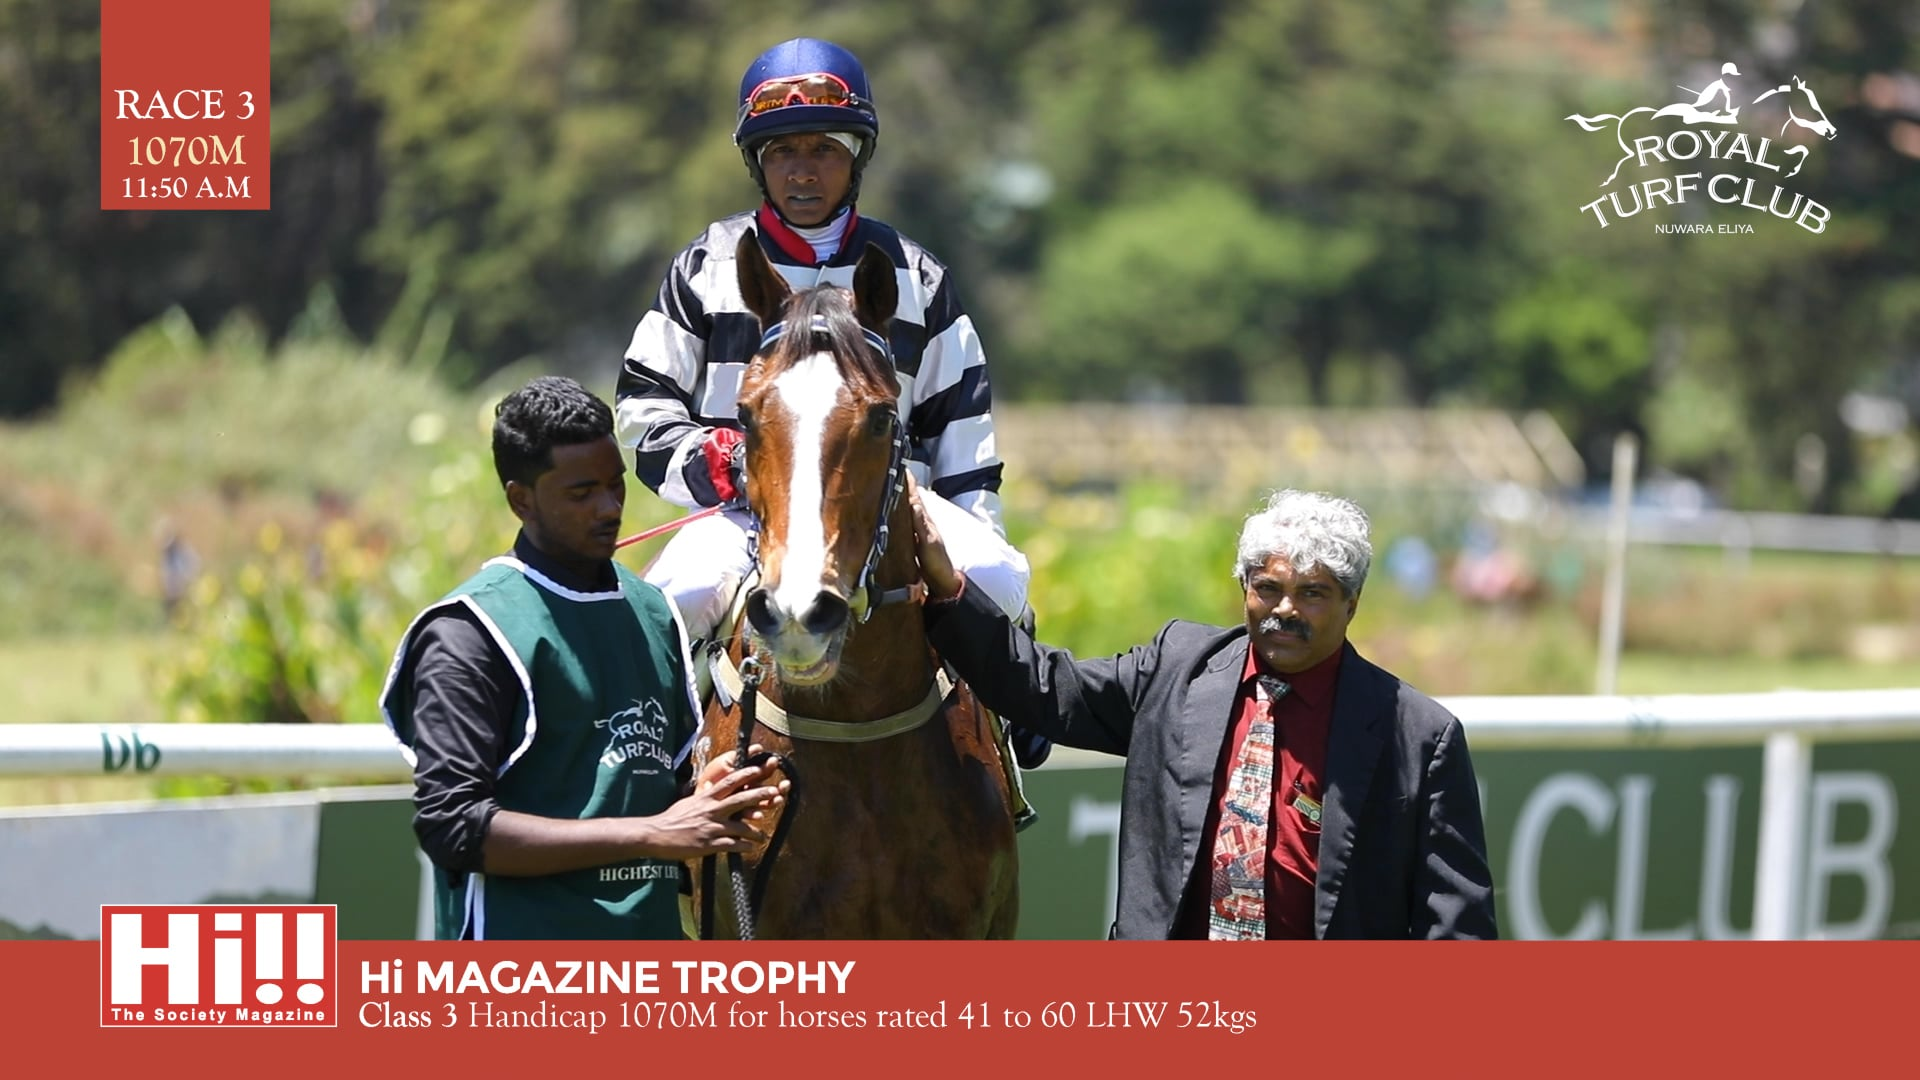 Hi Magazine Trophy